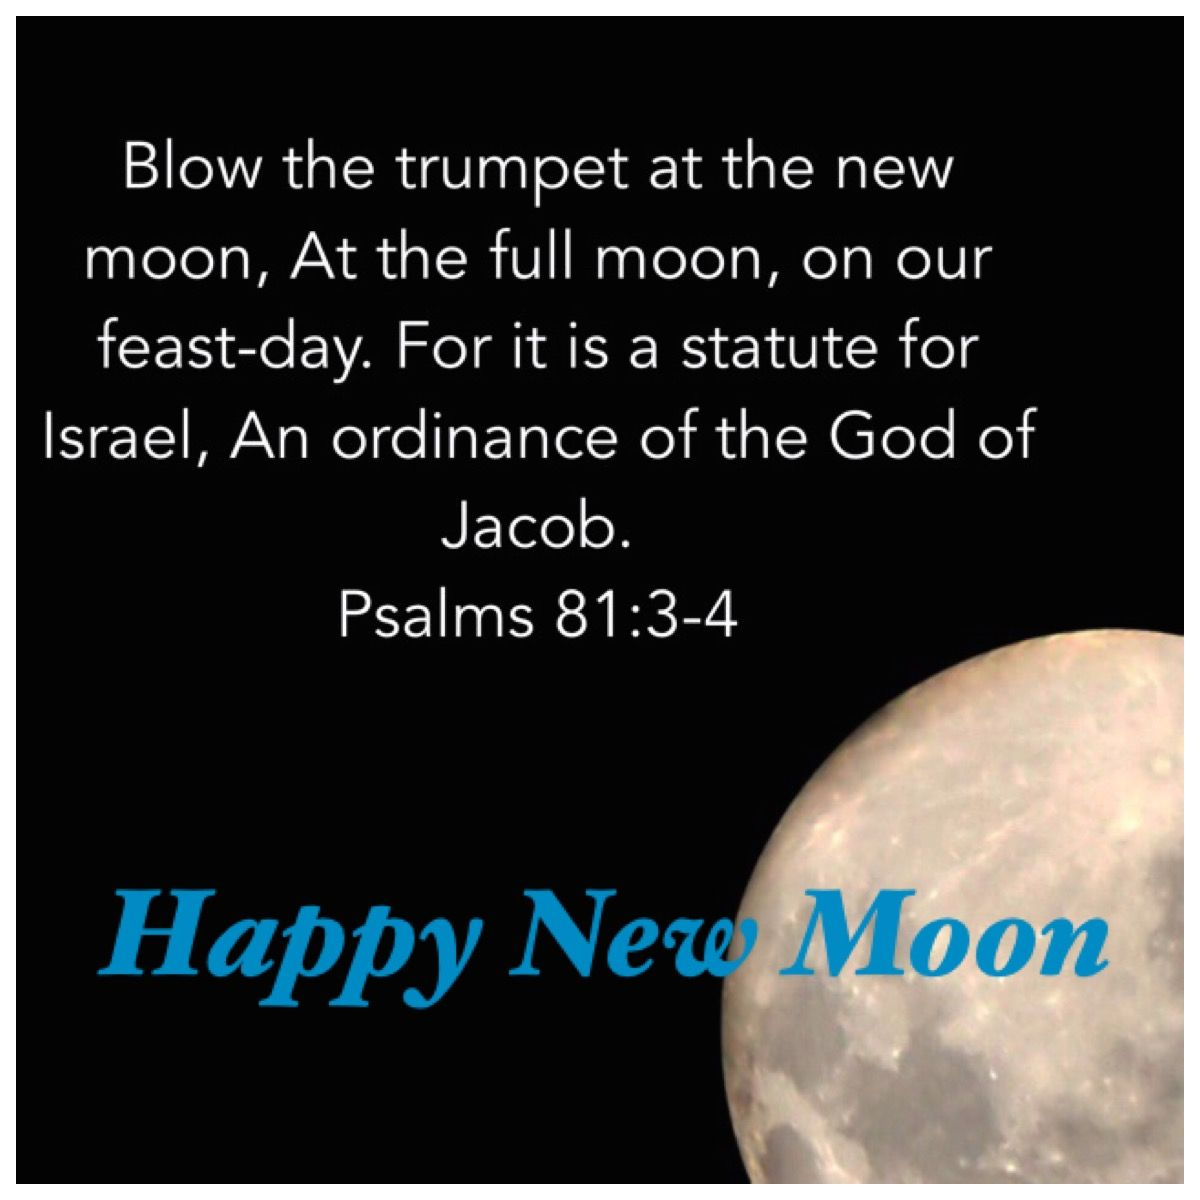 Happy New Moon Israel Rosh Chodesh Psalms New Moon